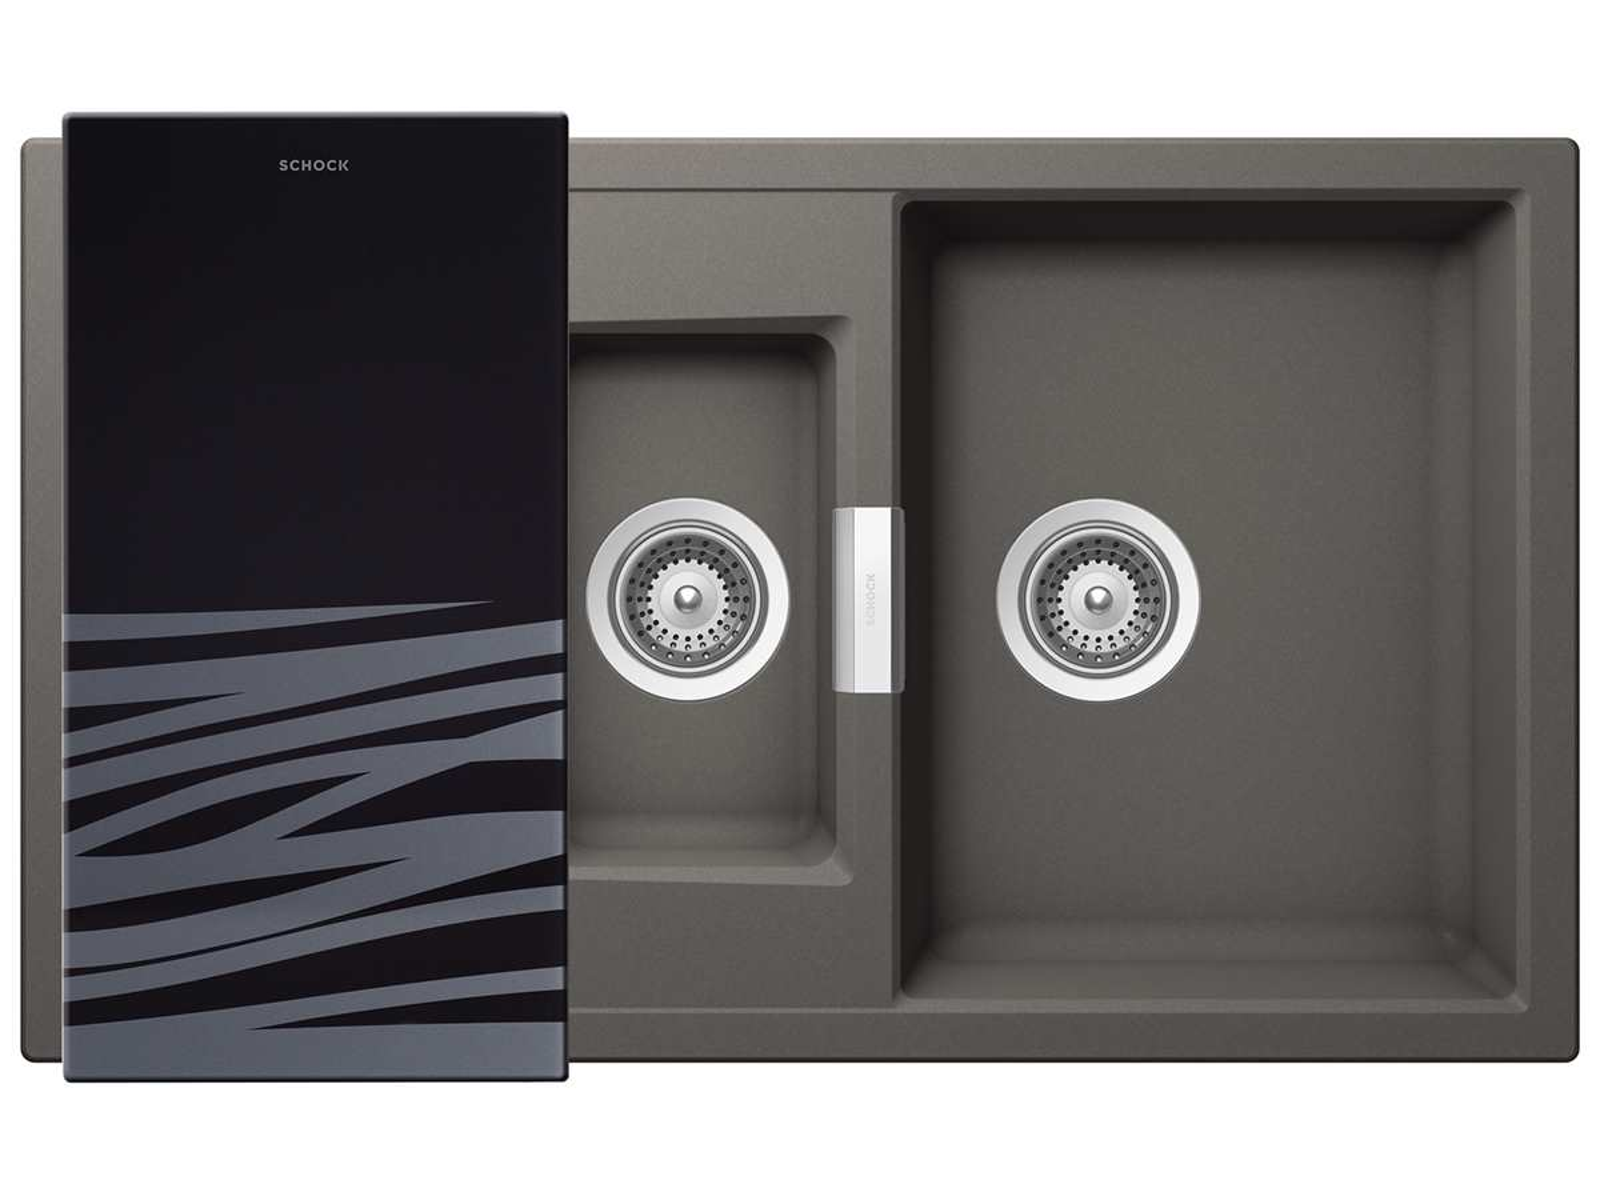 Schock Mono D-150 A Silverstone - MOND150ASIL Granitspüle